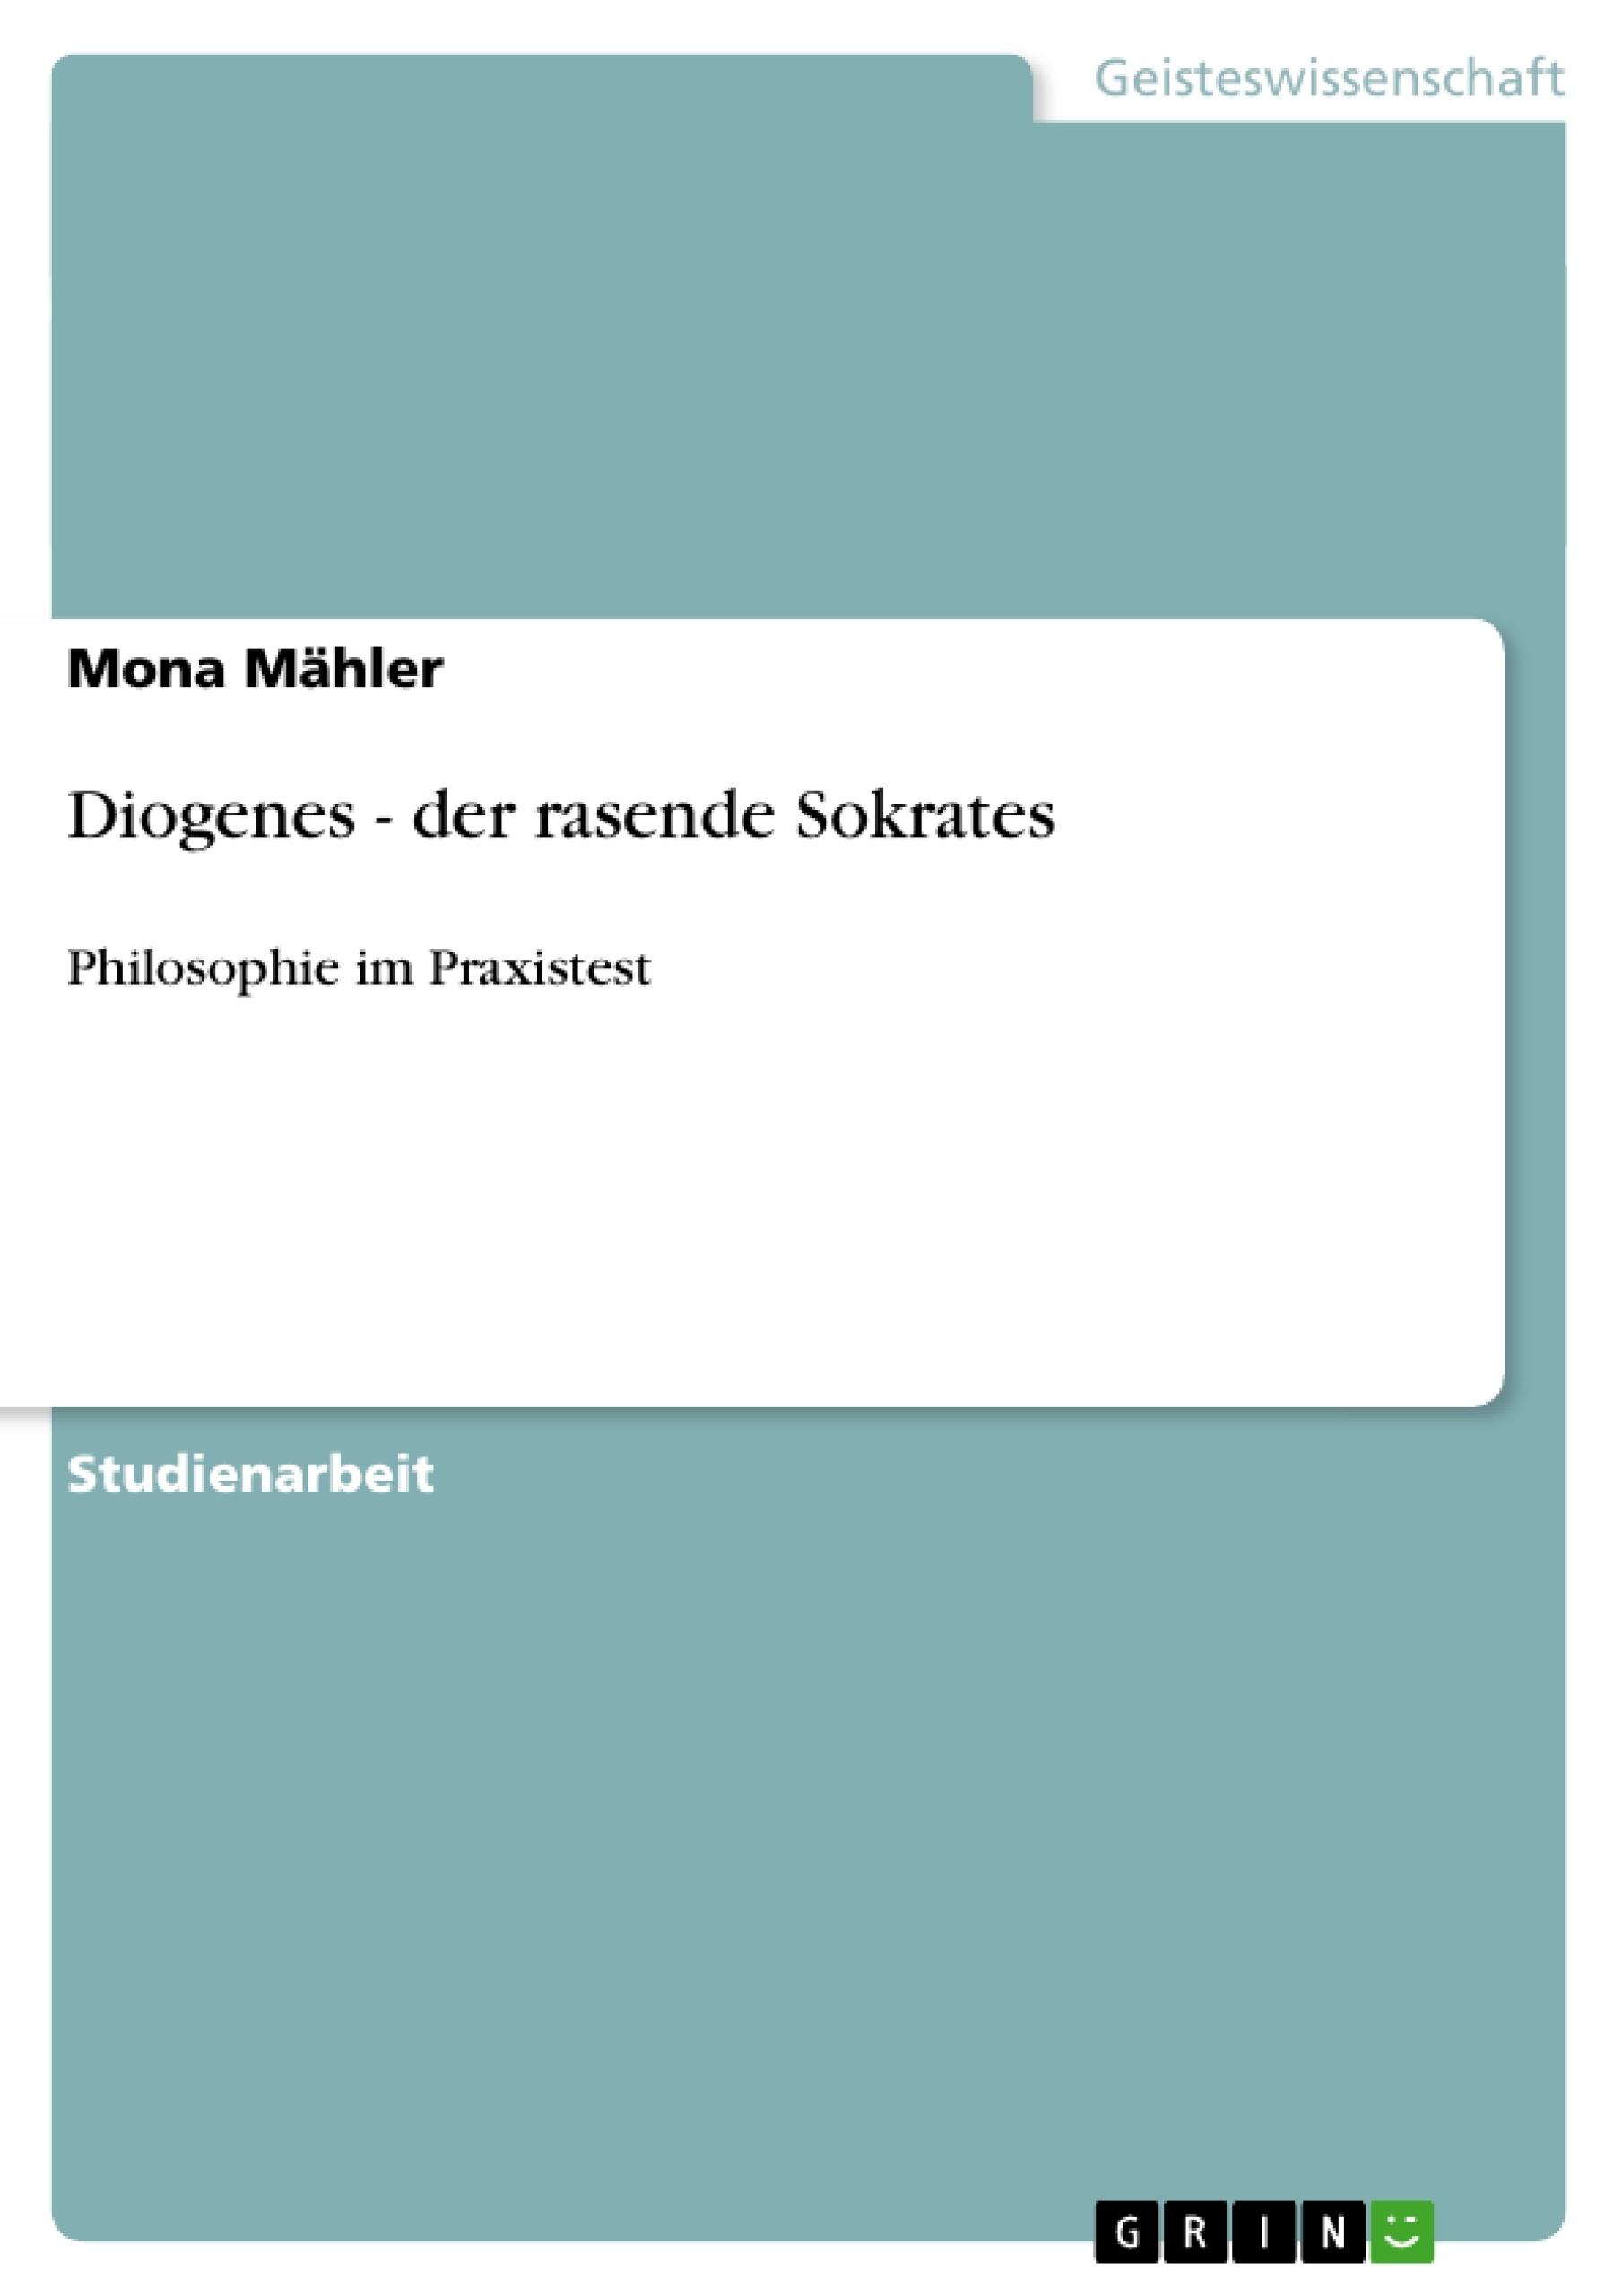 Titel: Diogenes - der rasende Sokrates